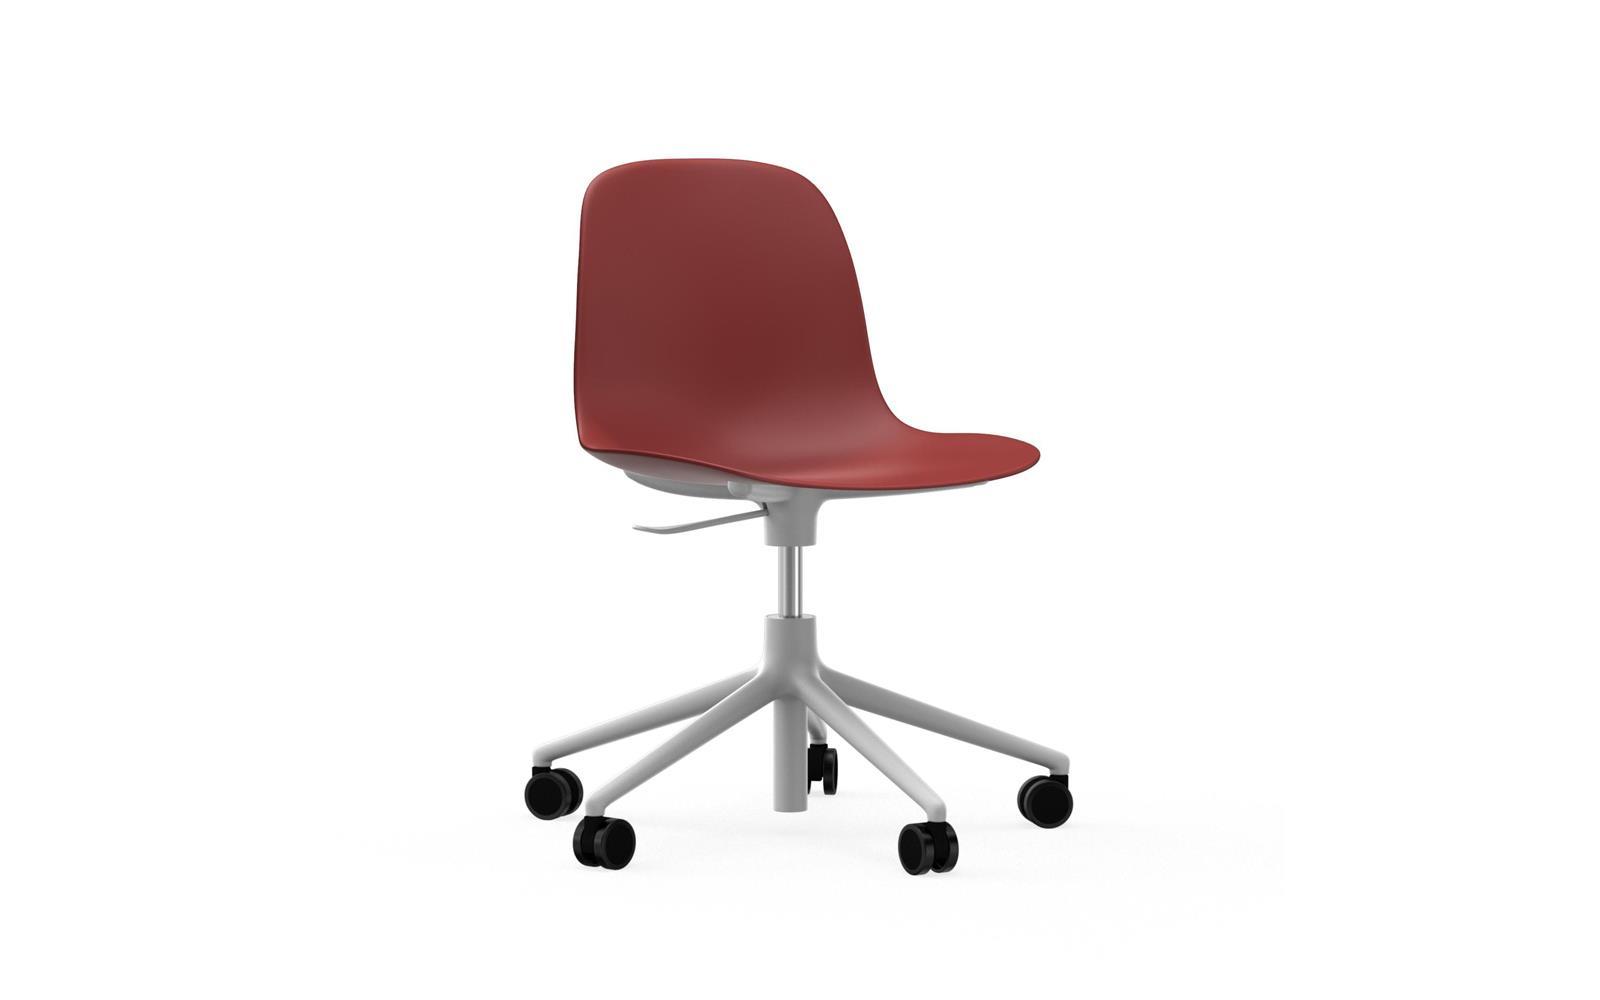 Form Chair Swivel 5w Gaslift White Alu Red